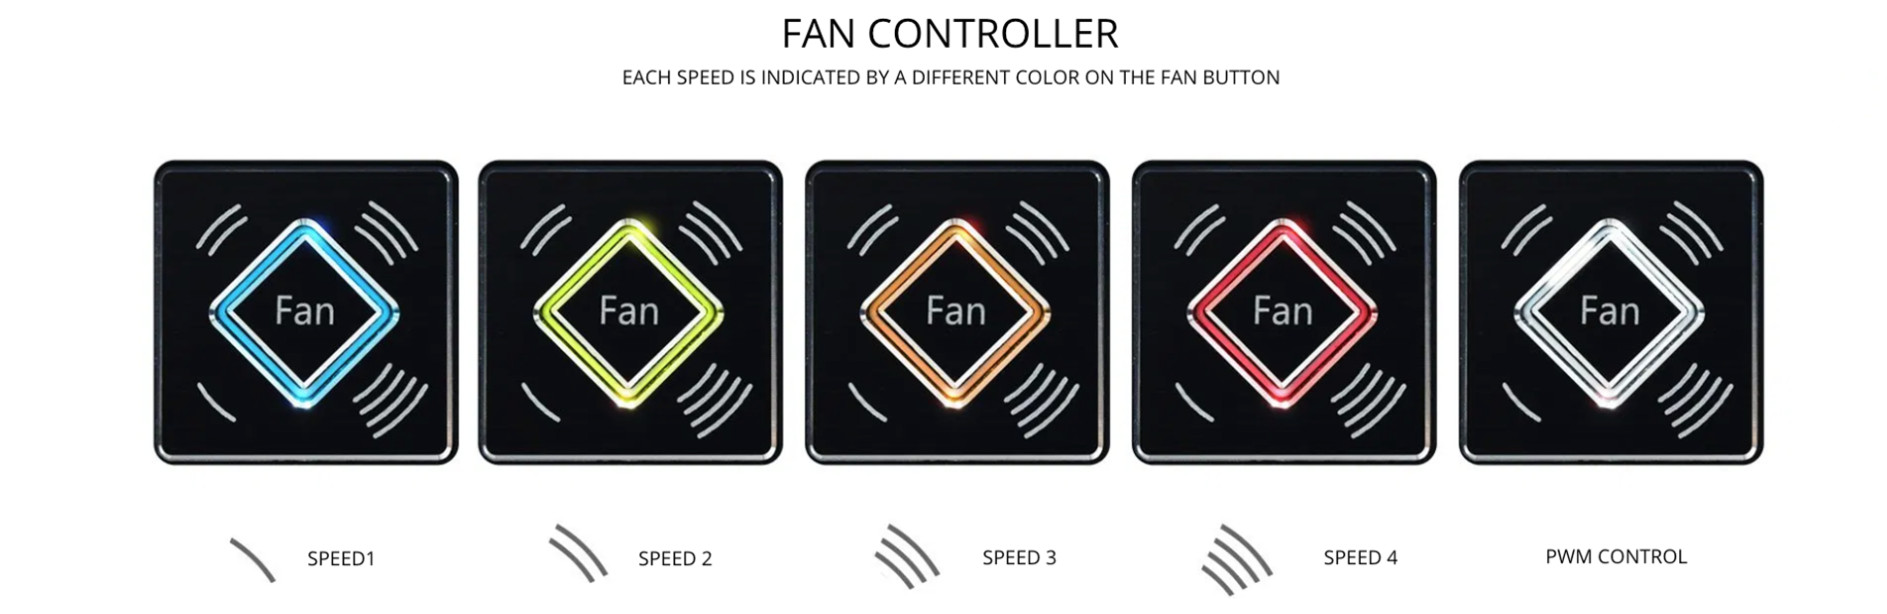 Bàn Gaming Desk Lian-Li DK-04FX giới thiệu 3